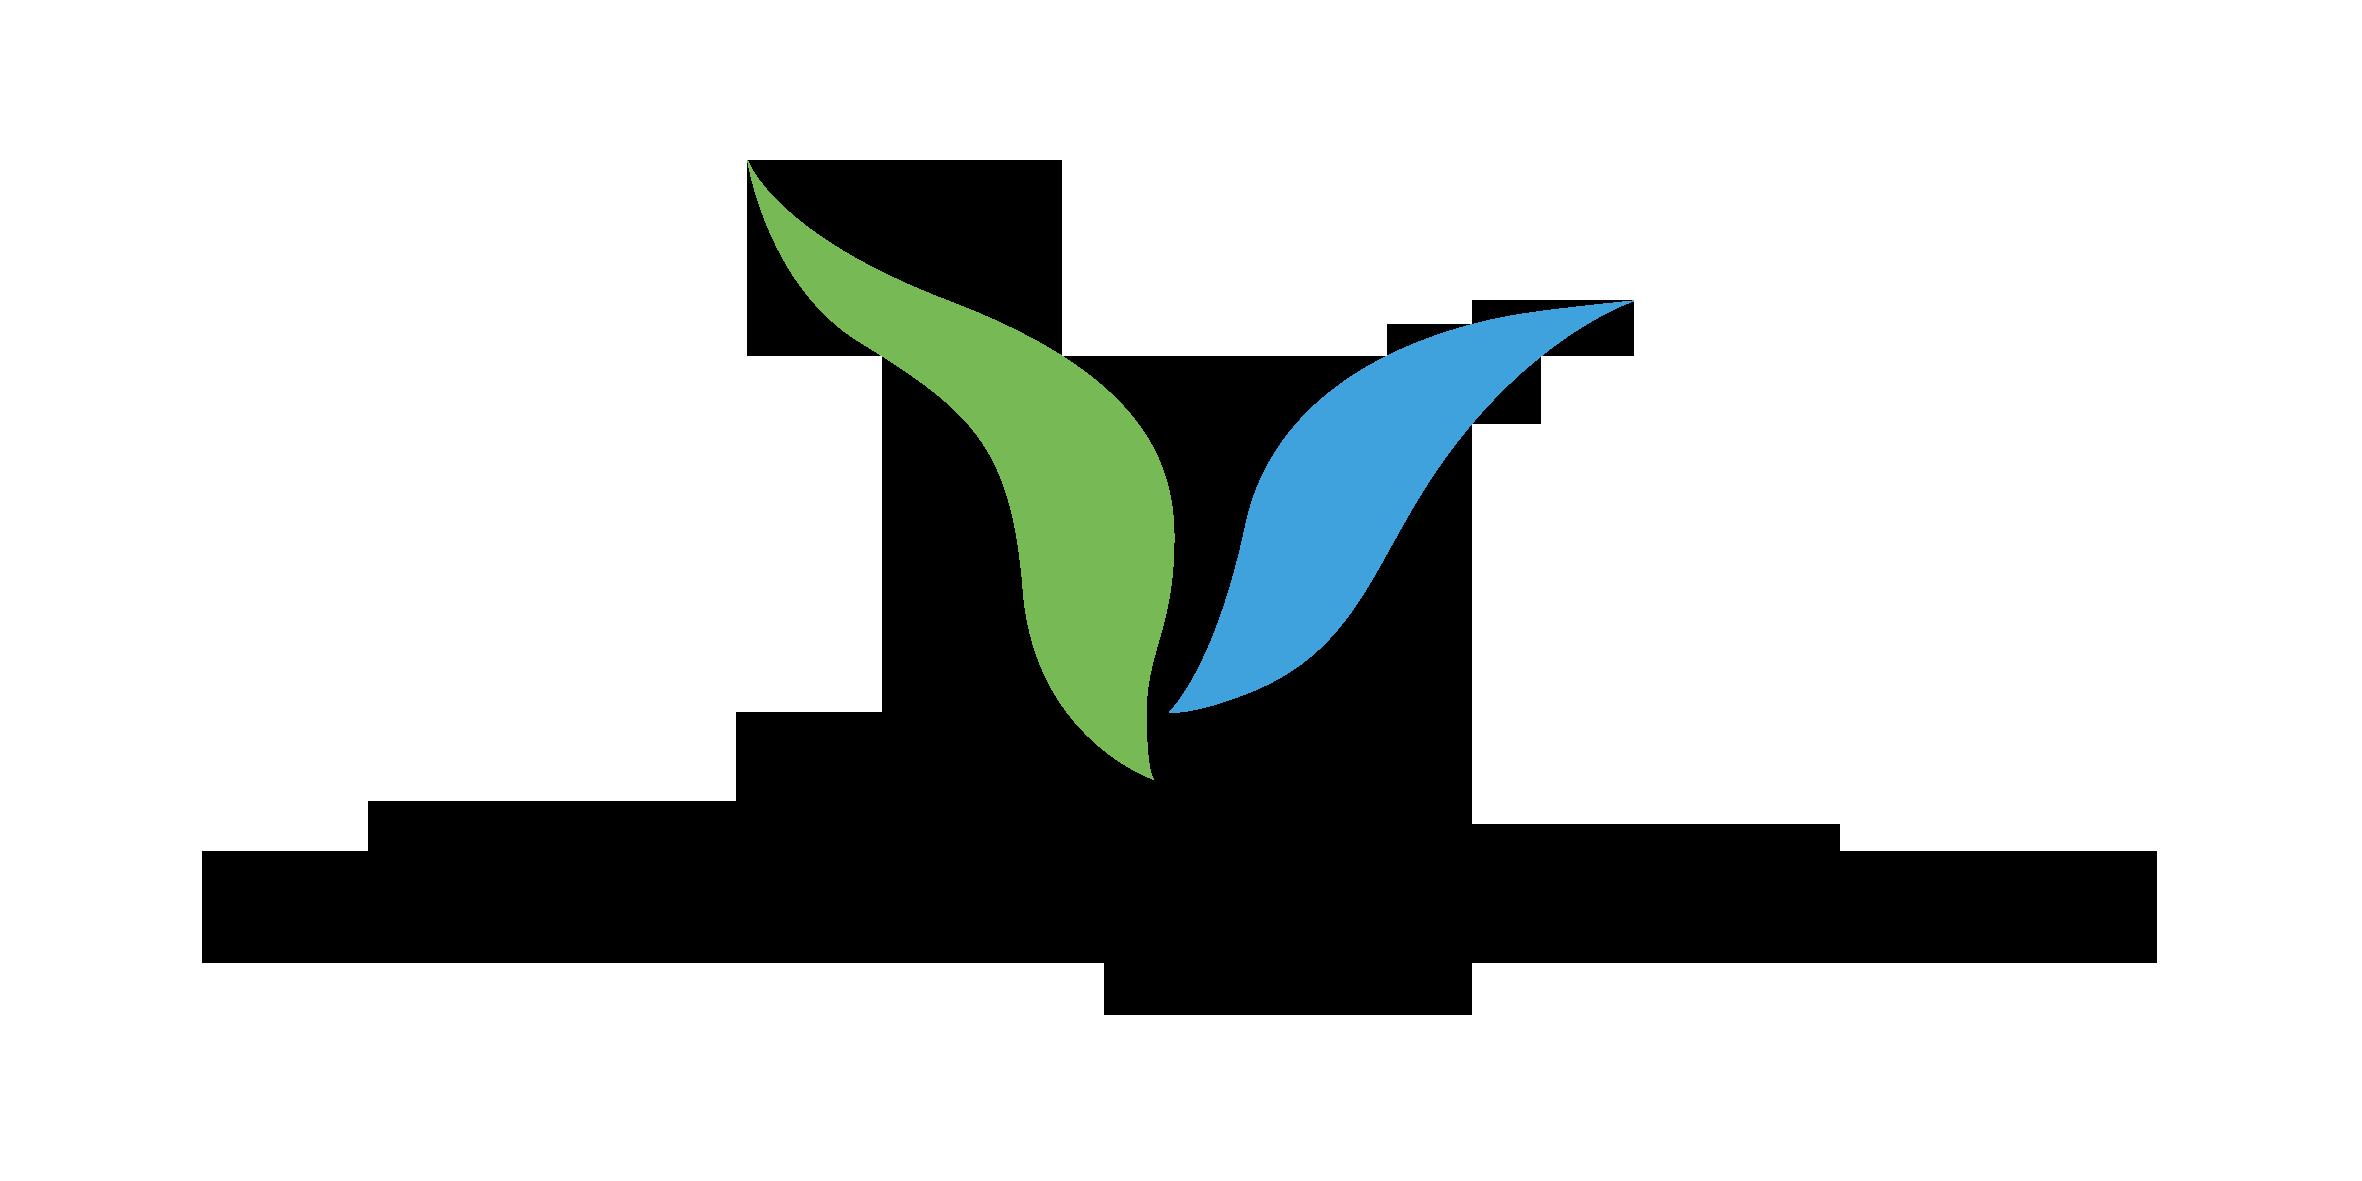 oddluzenisjistotou_logo_rgb.png